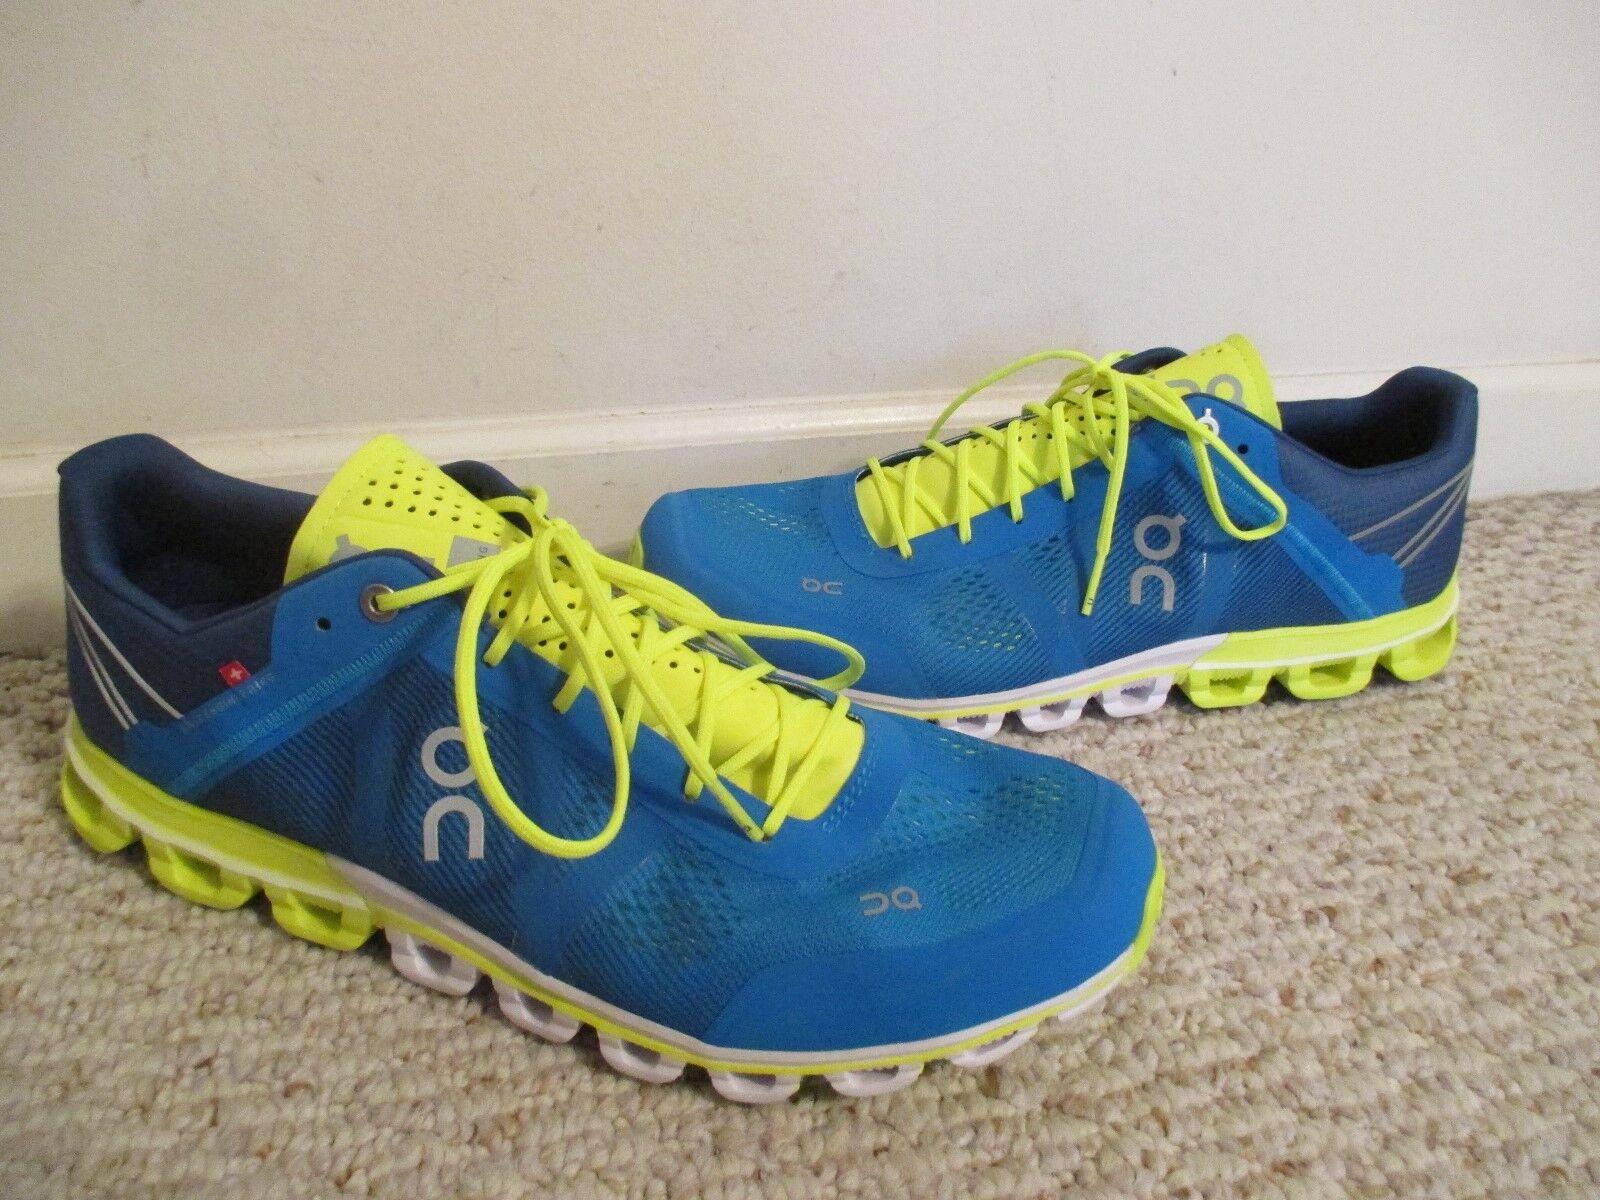 f38de91f19 On Cloudflow shoes Mens Size 10.5 Petrol Neon 15-4329 Running ...